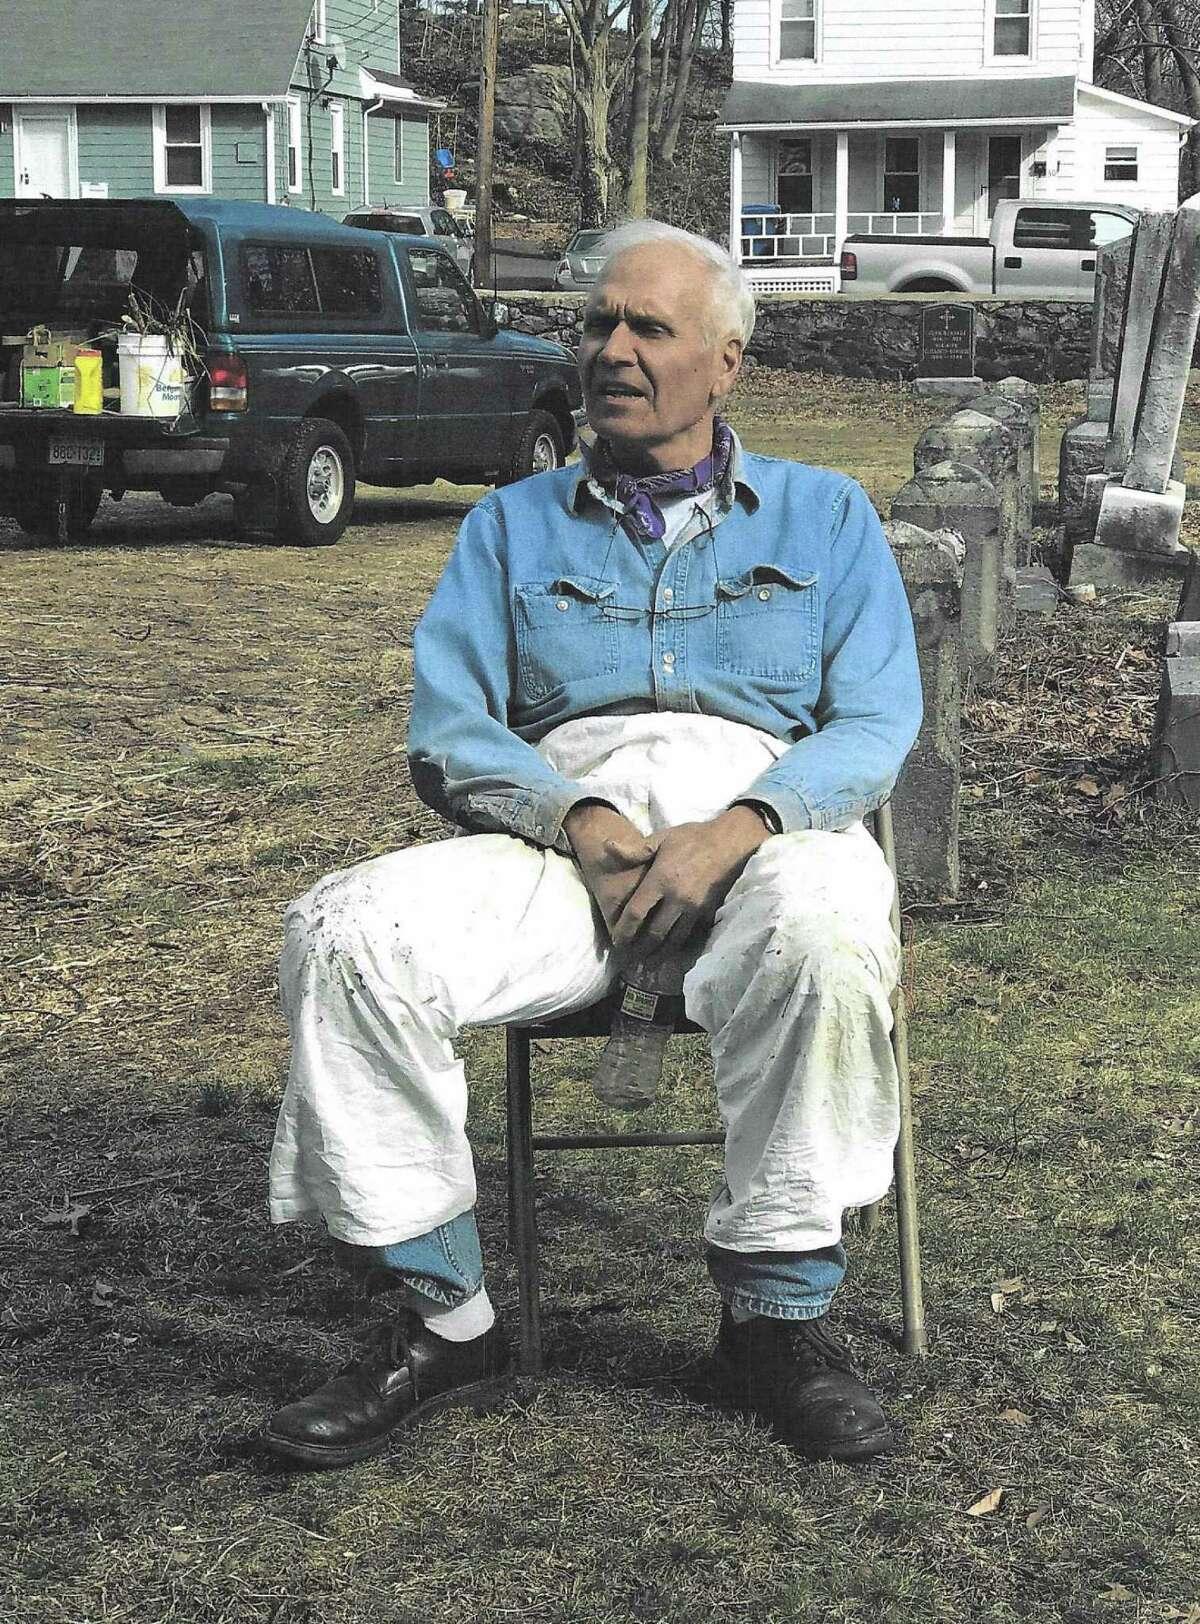 Norwalk resident, store owner and volunteer Casey Onaitis at Norwalk Union Cemetery, where he worked to maintain gravesites. Onaitis died Sept. 10, 2018.